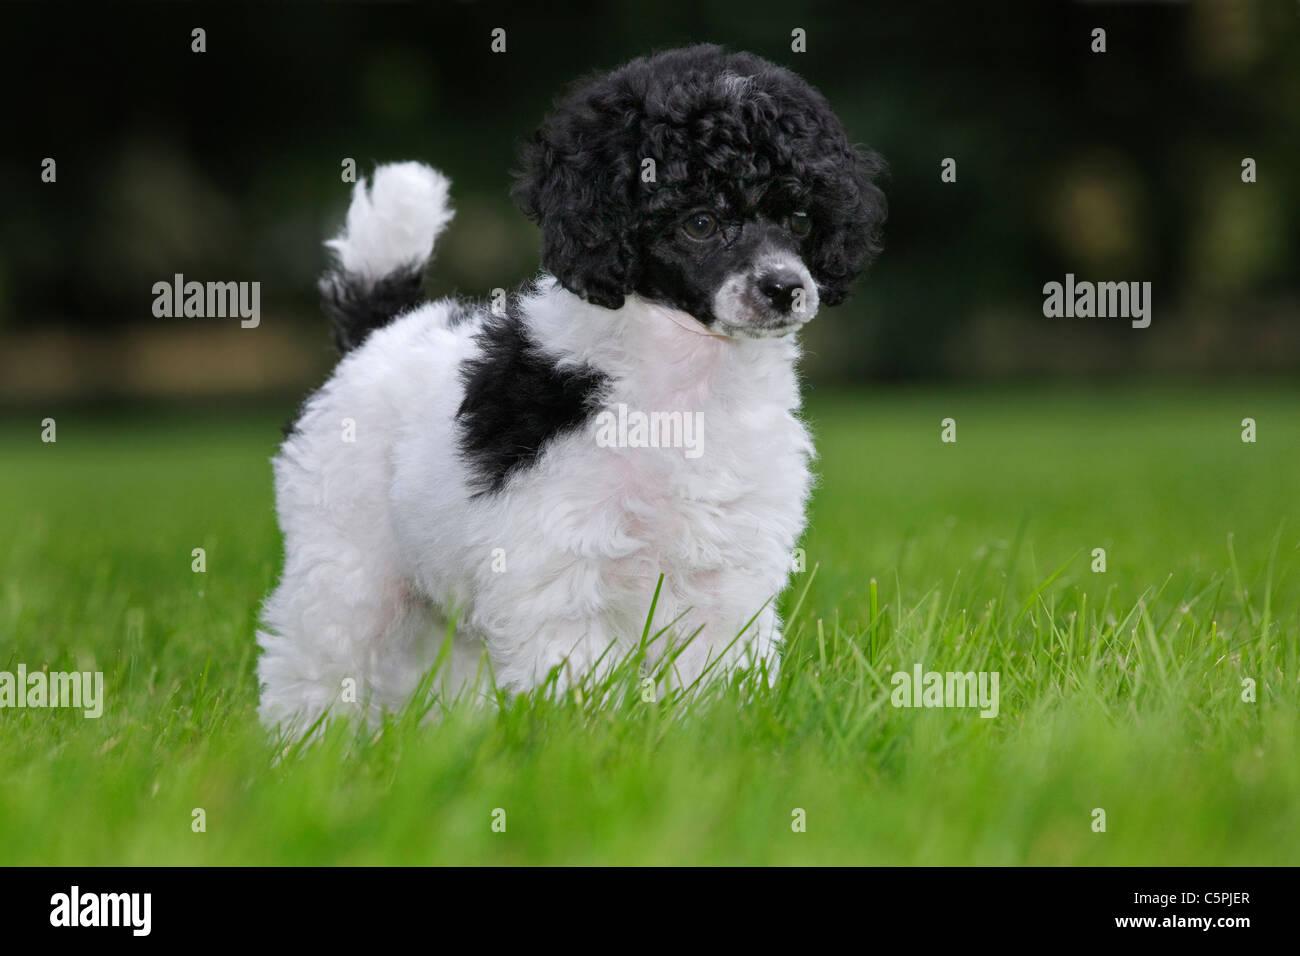 Black And White Miniature Poodle Dog Stock Photos & Black